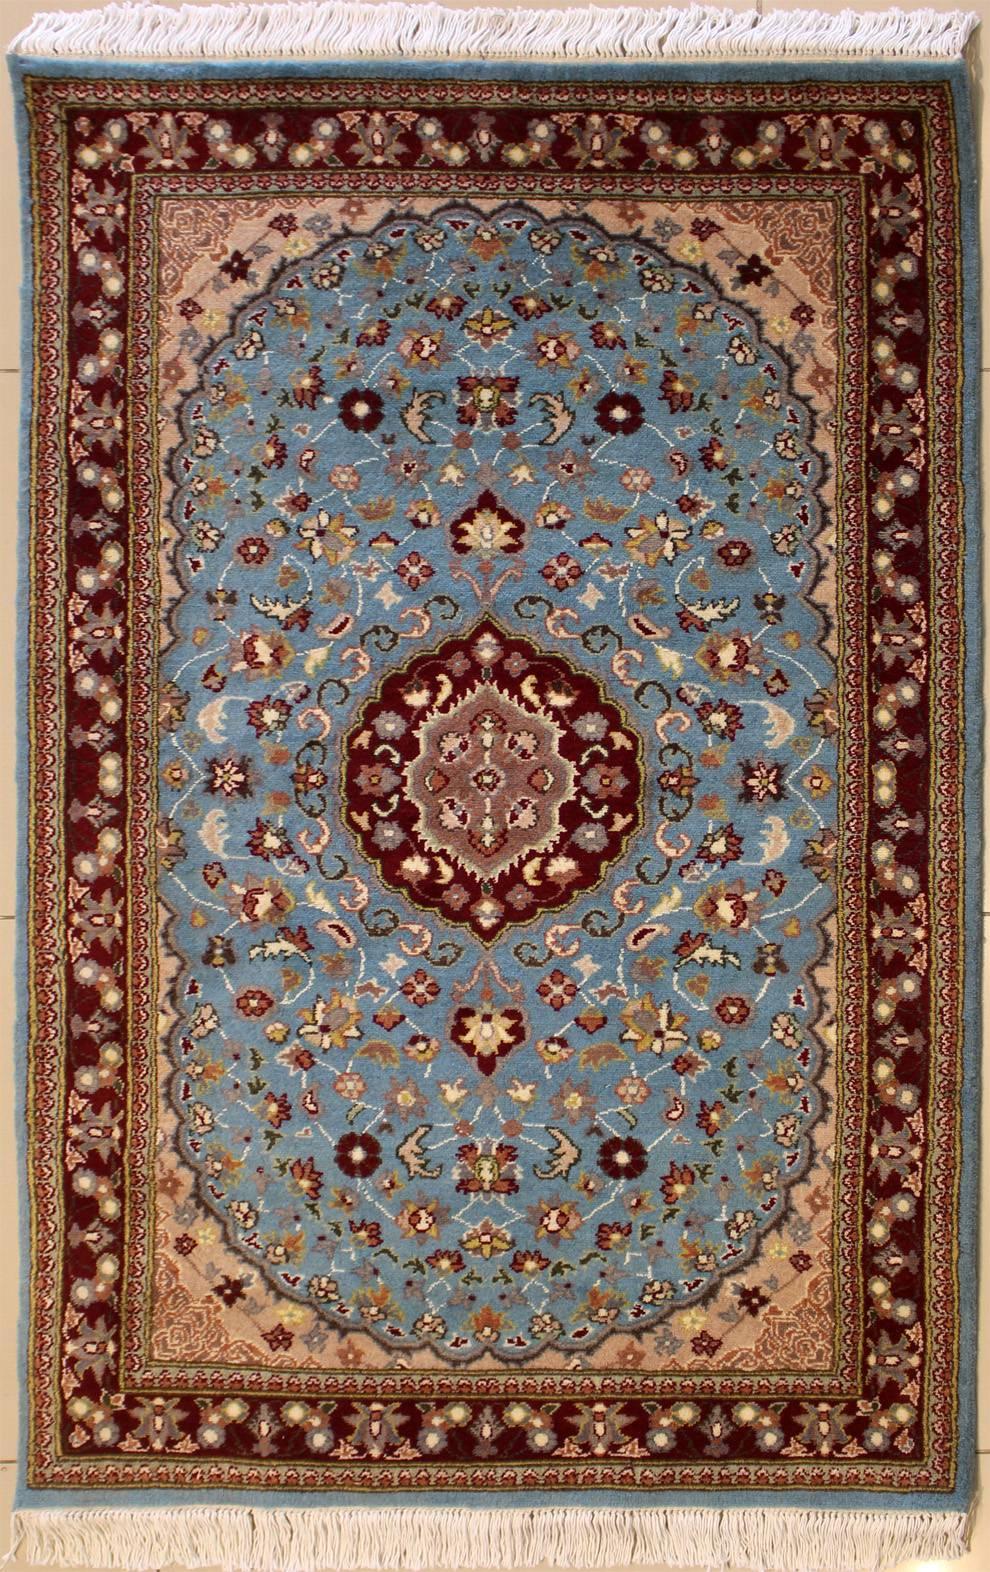 3'0x5'2 Rug - Floral - Handmade Pak Persian High Quality ...